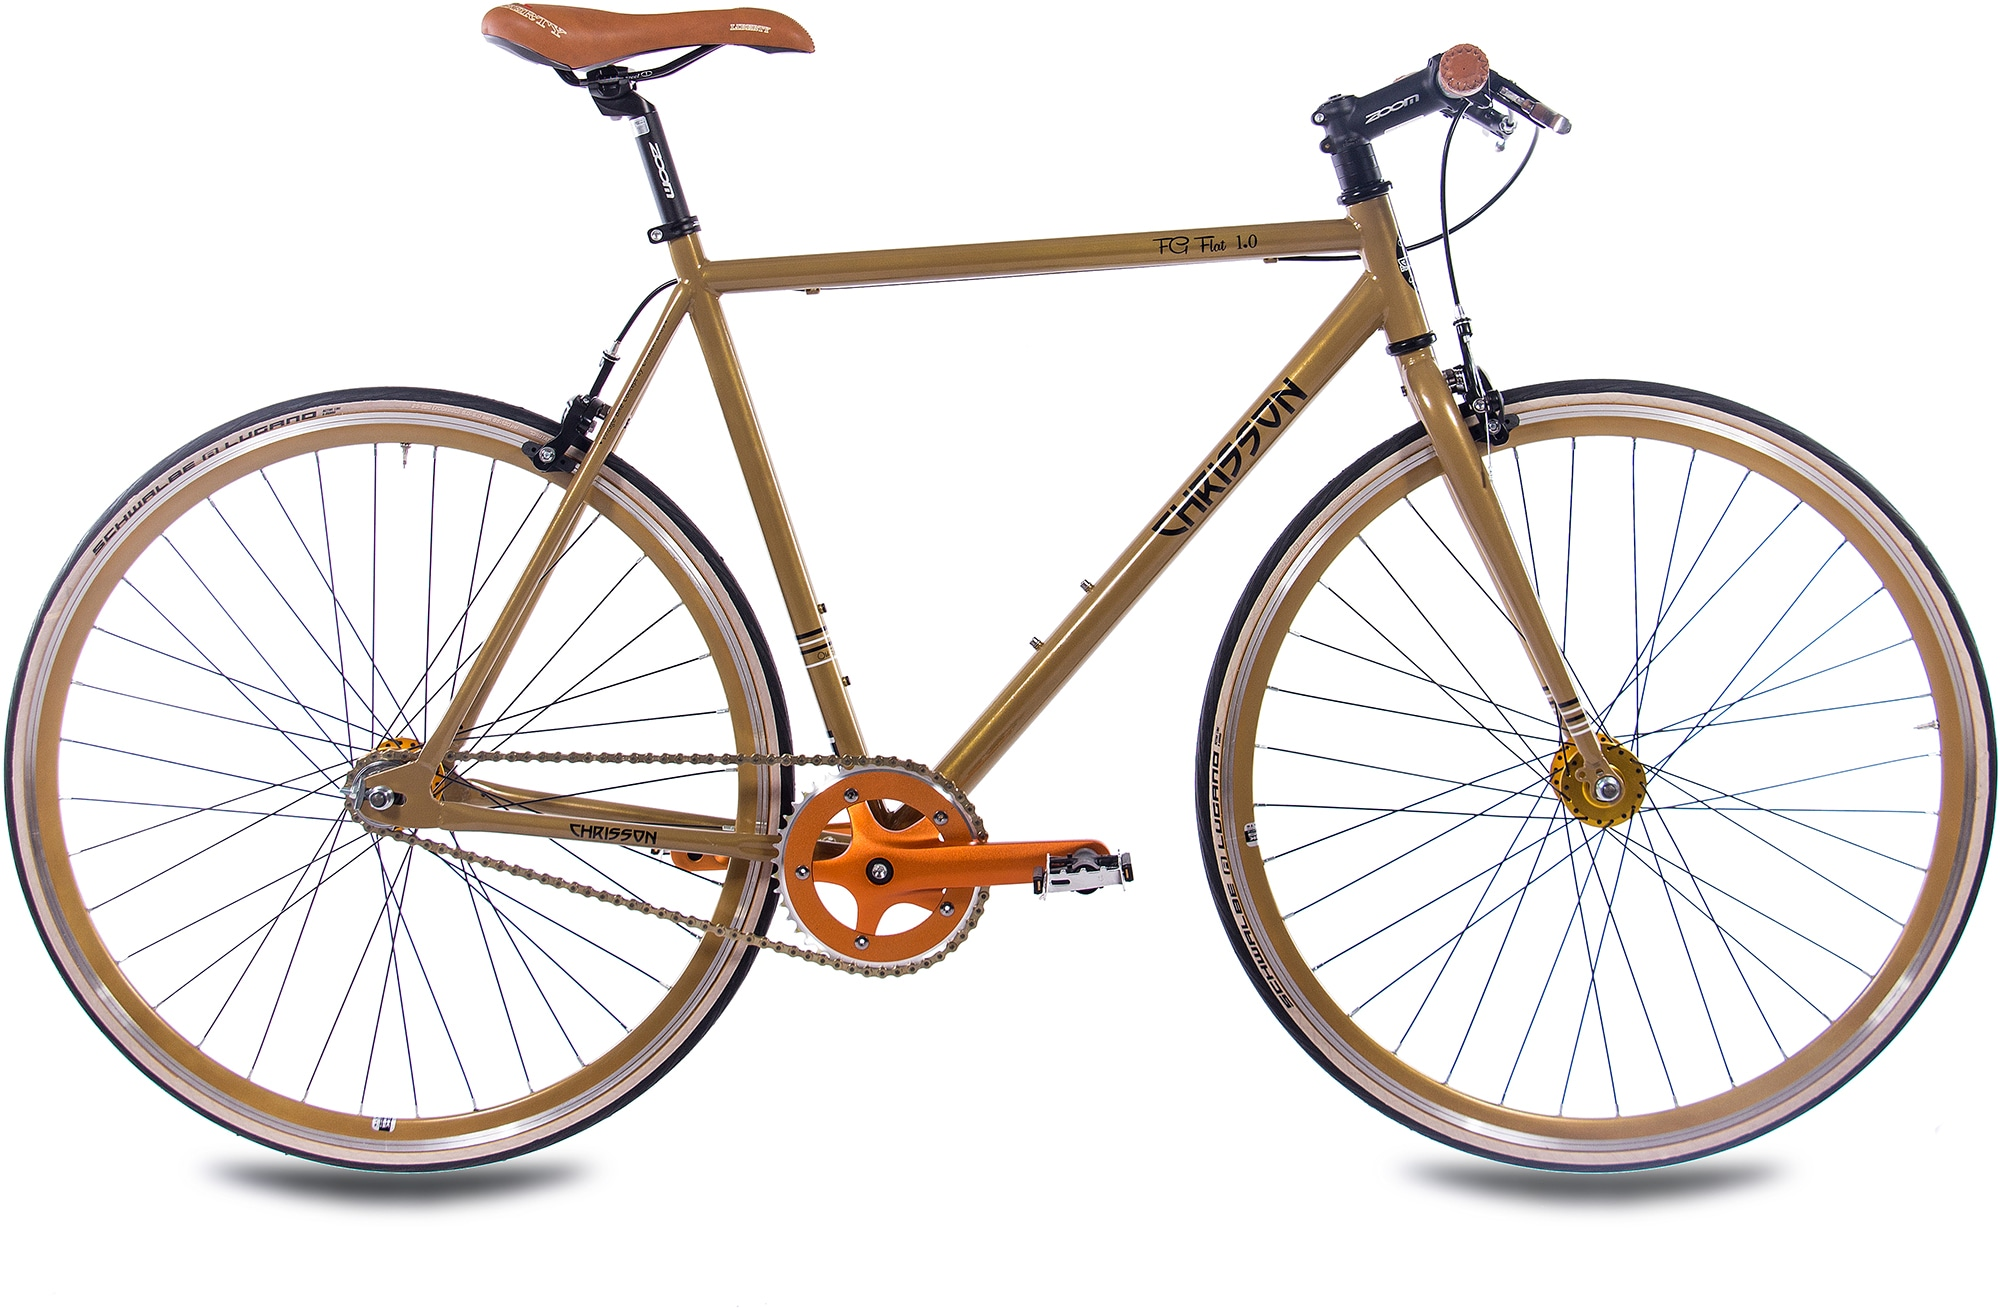 Chrisson Singlespeed FG Flat 1.0, 1 Gang ohne Schaltung (1-tlg.) goldfarben Fahrräder Zubehör Fahrrad